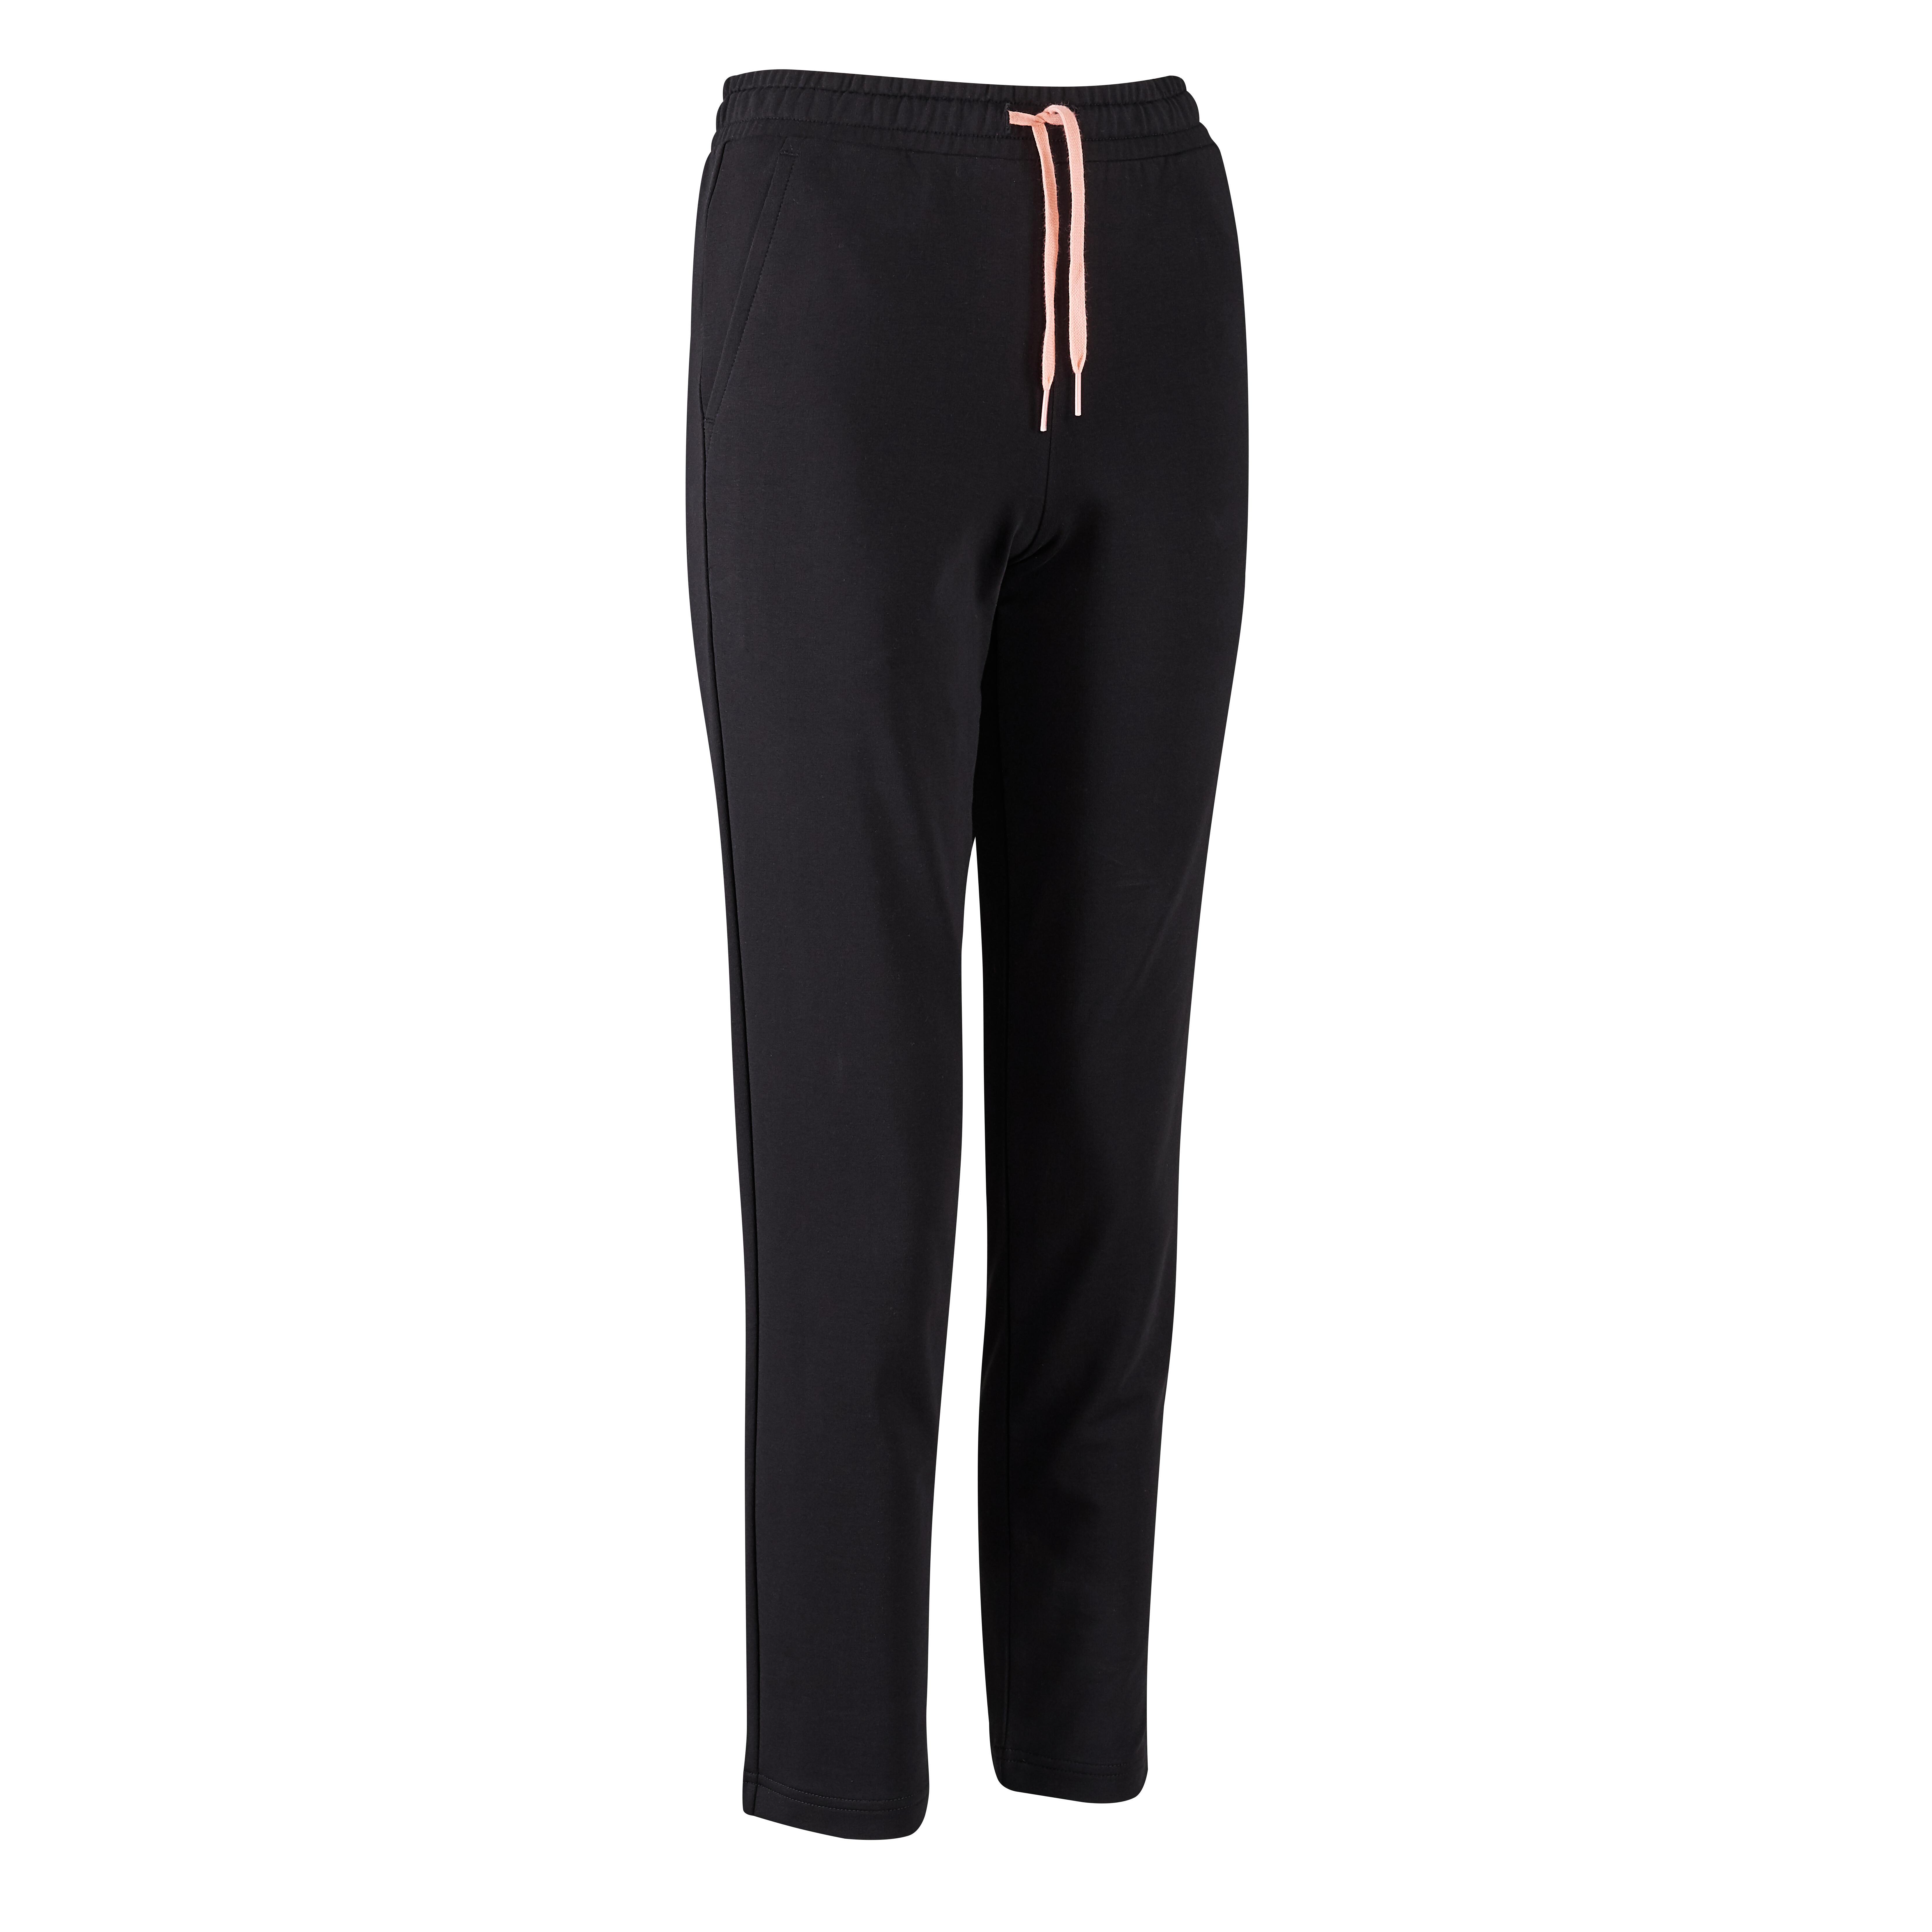 Pantalon de trening negru fete la Reducere poza